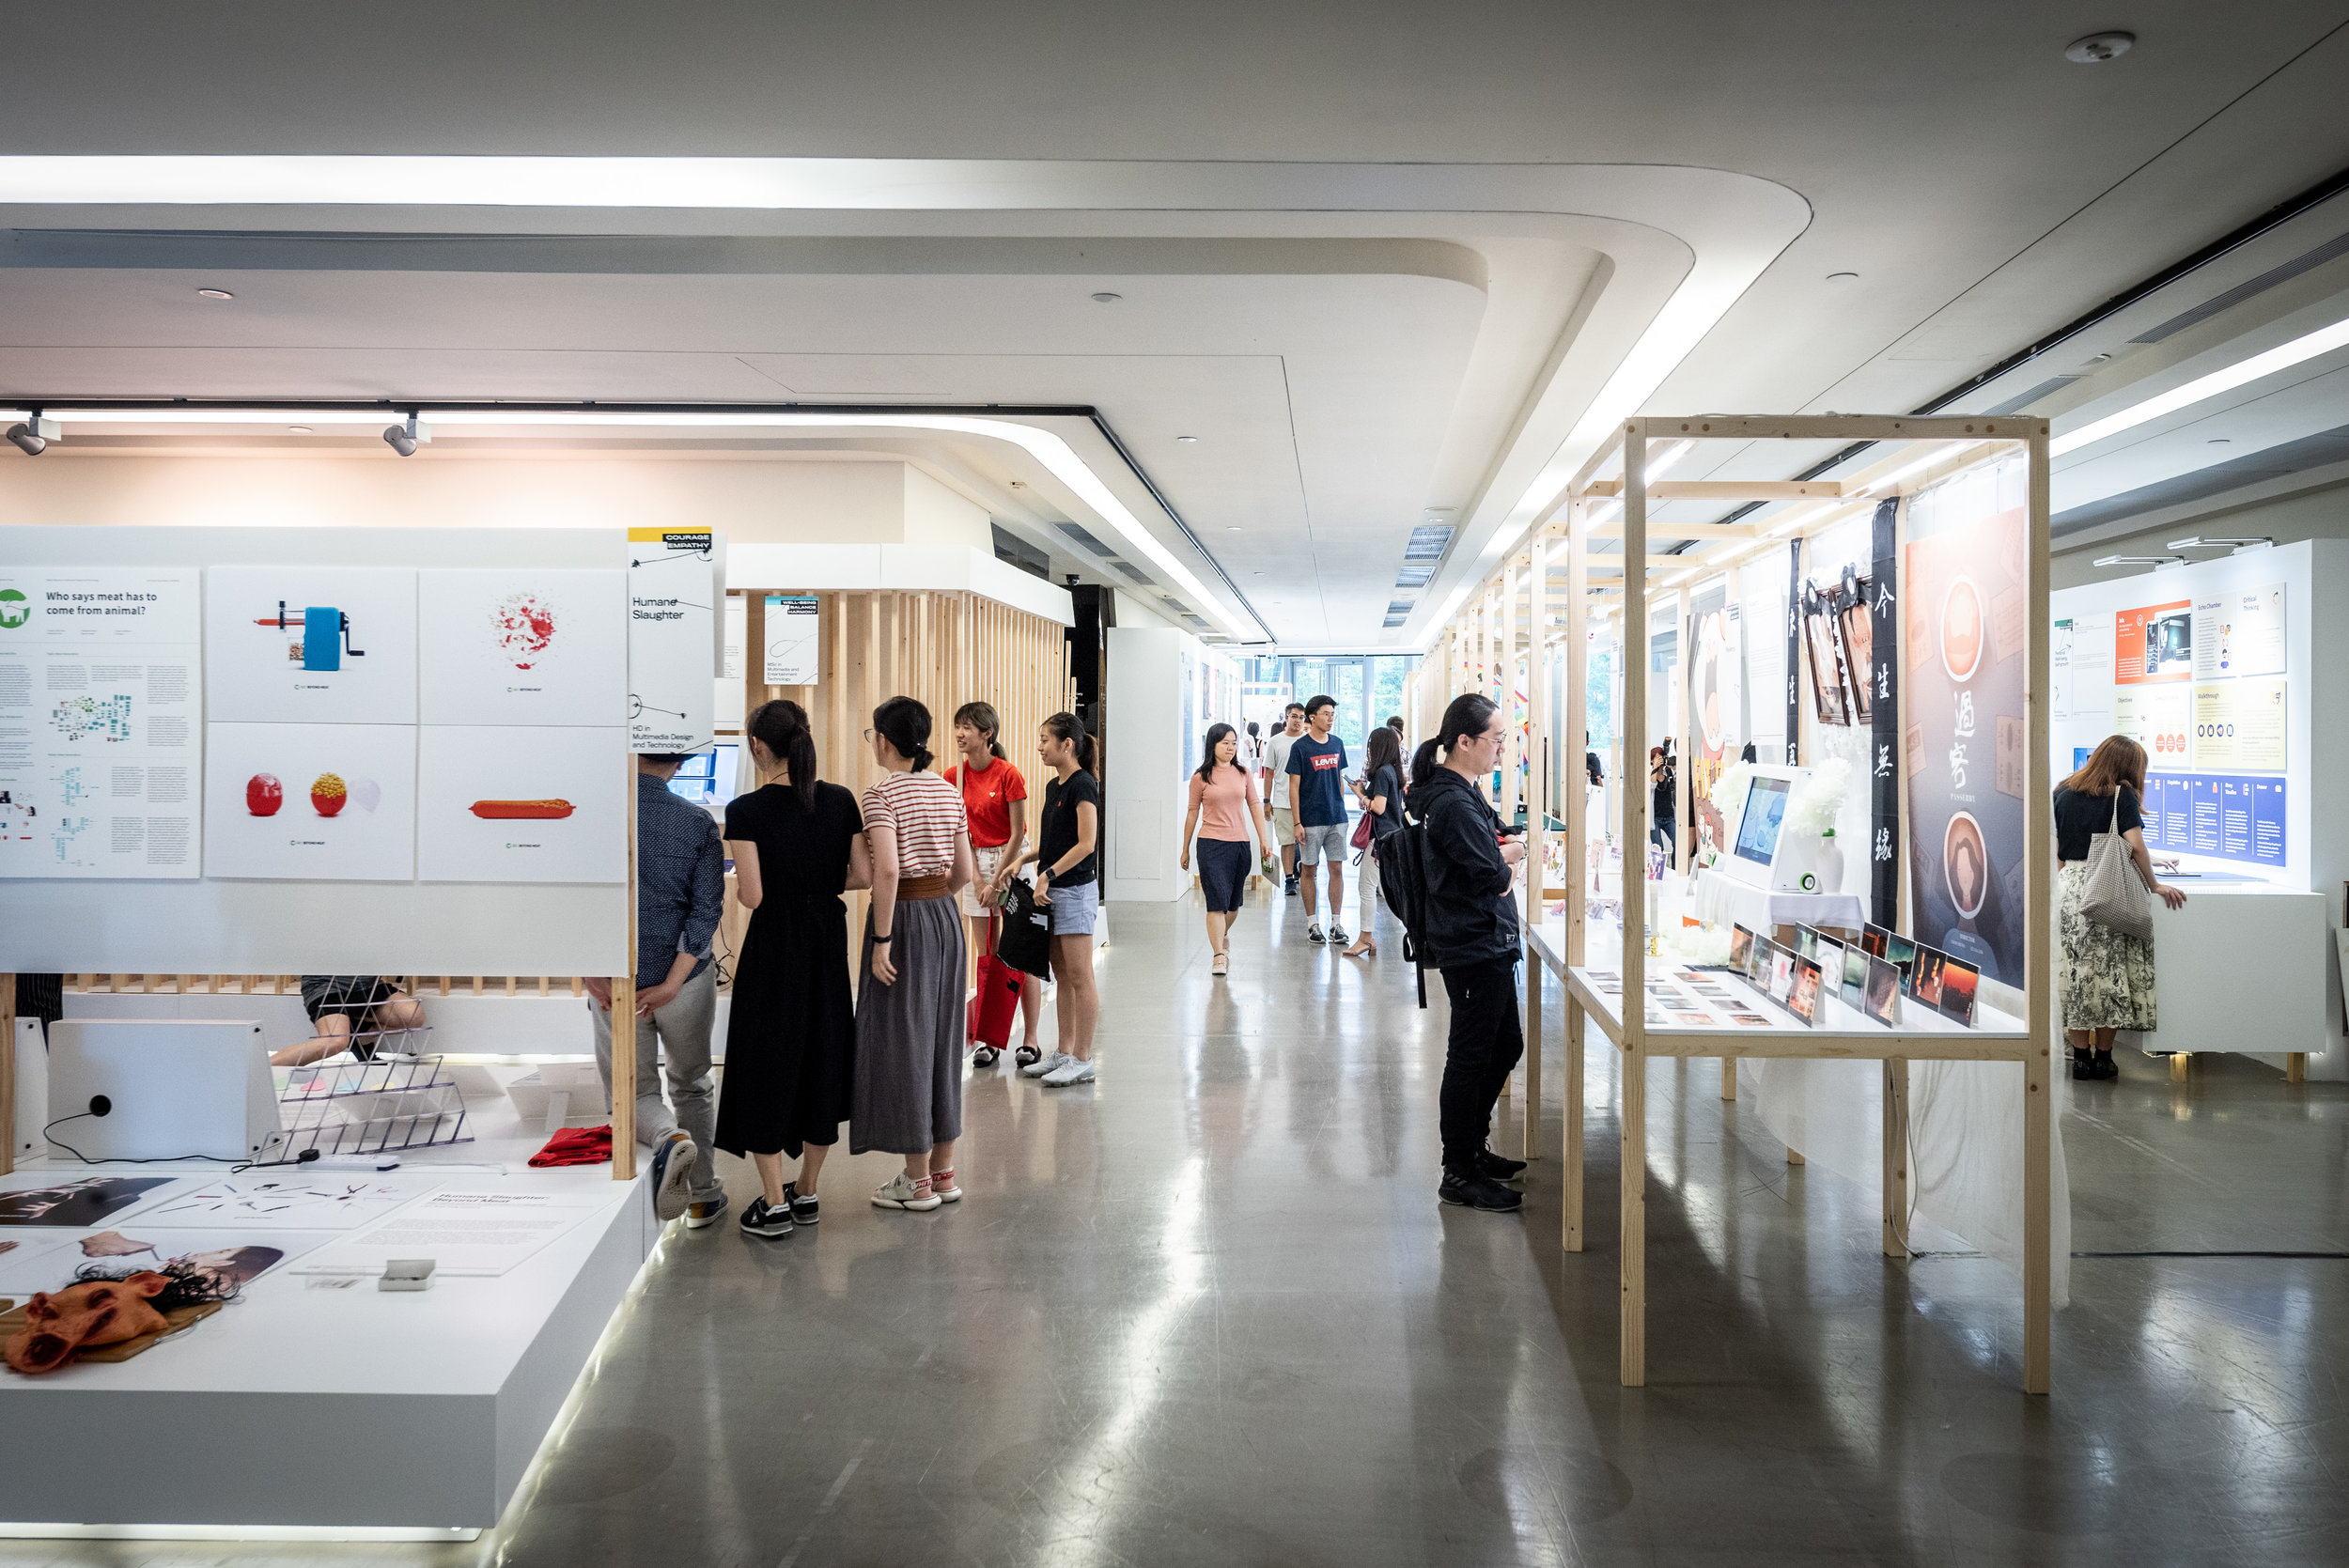 20190619 Poly U design school opening (192 of 219).jpg